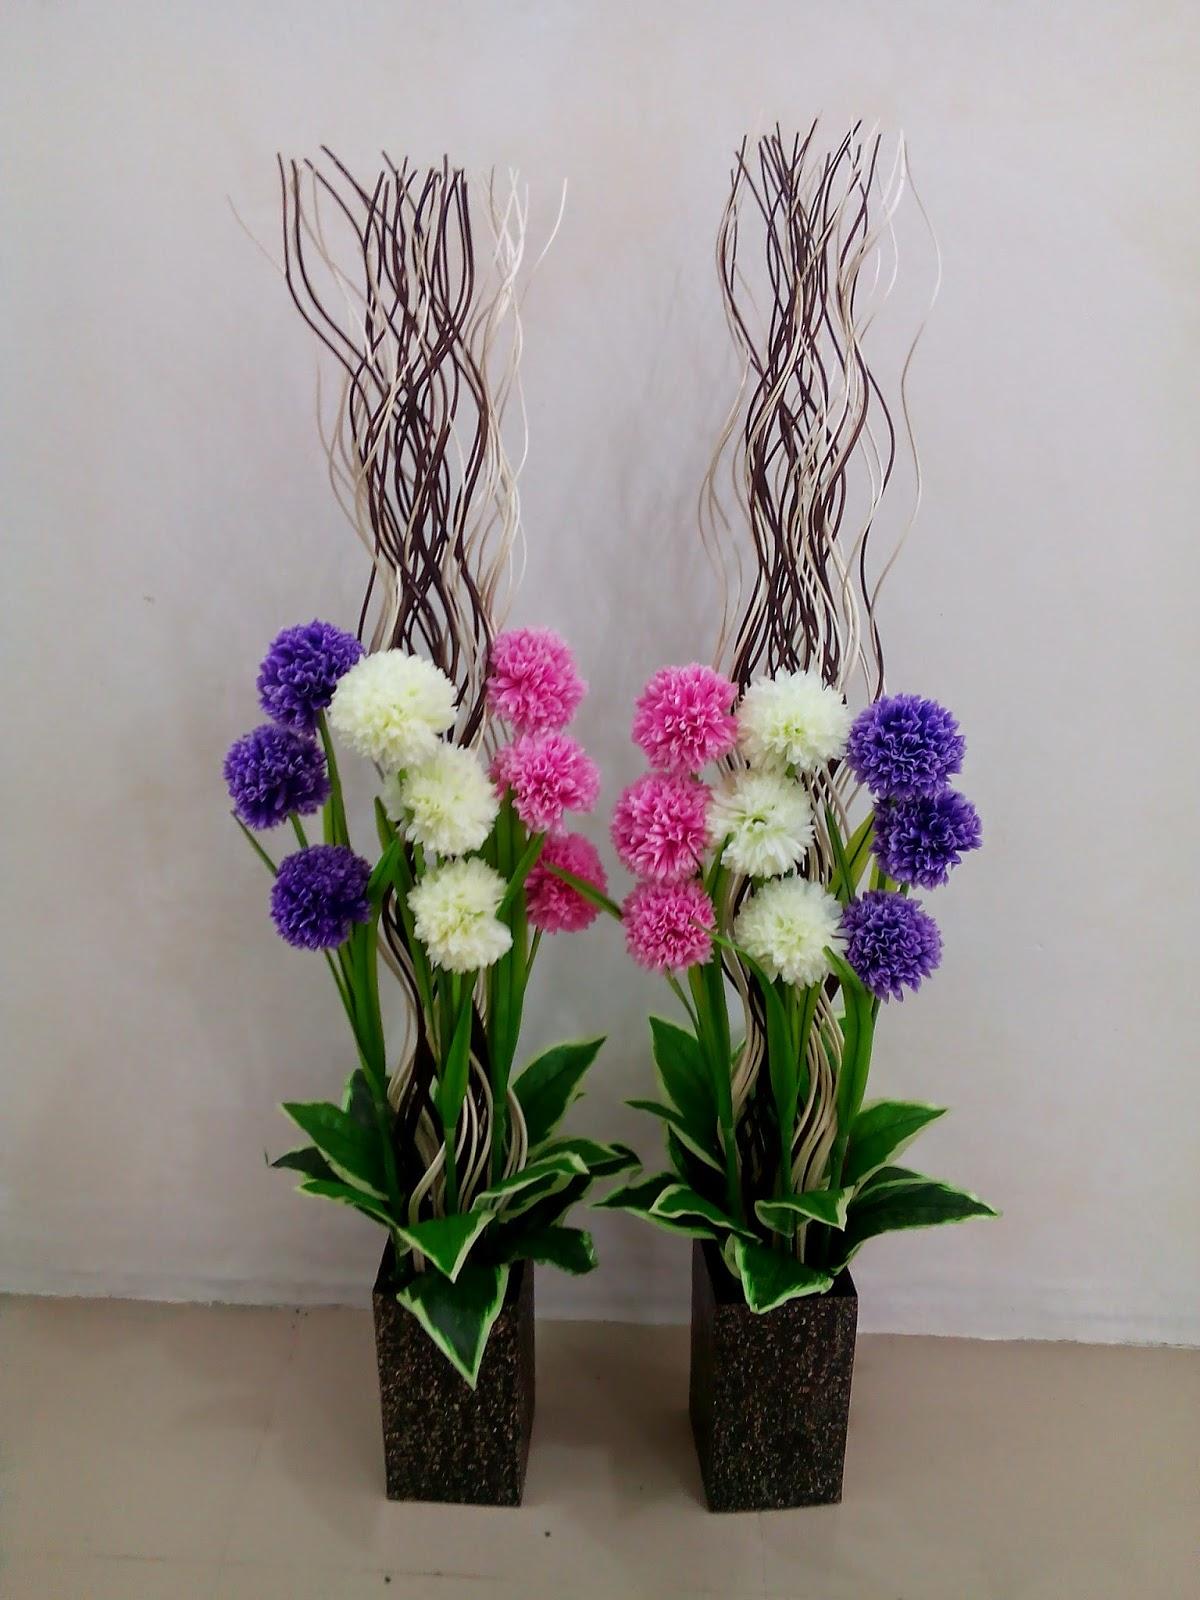 89 Terbaru Bunga Hias Di Sudut Ruang Tamu Bunga Hias